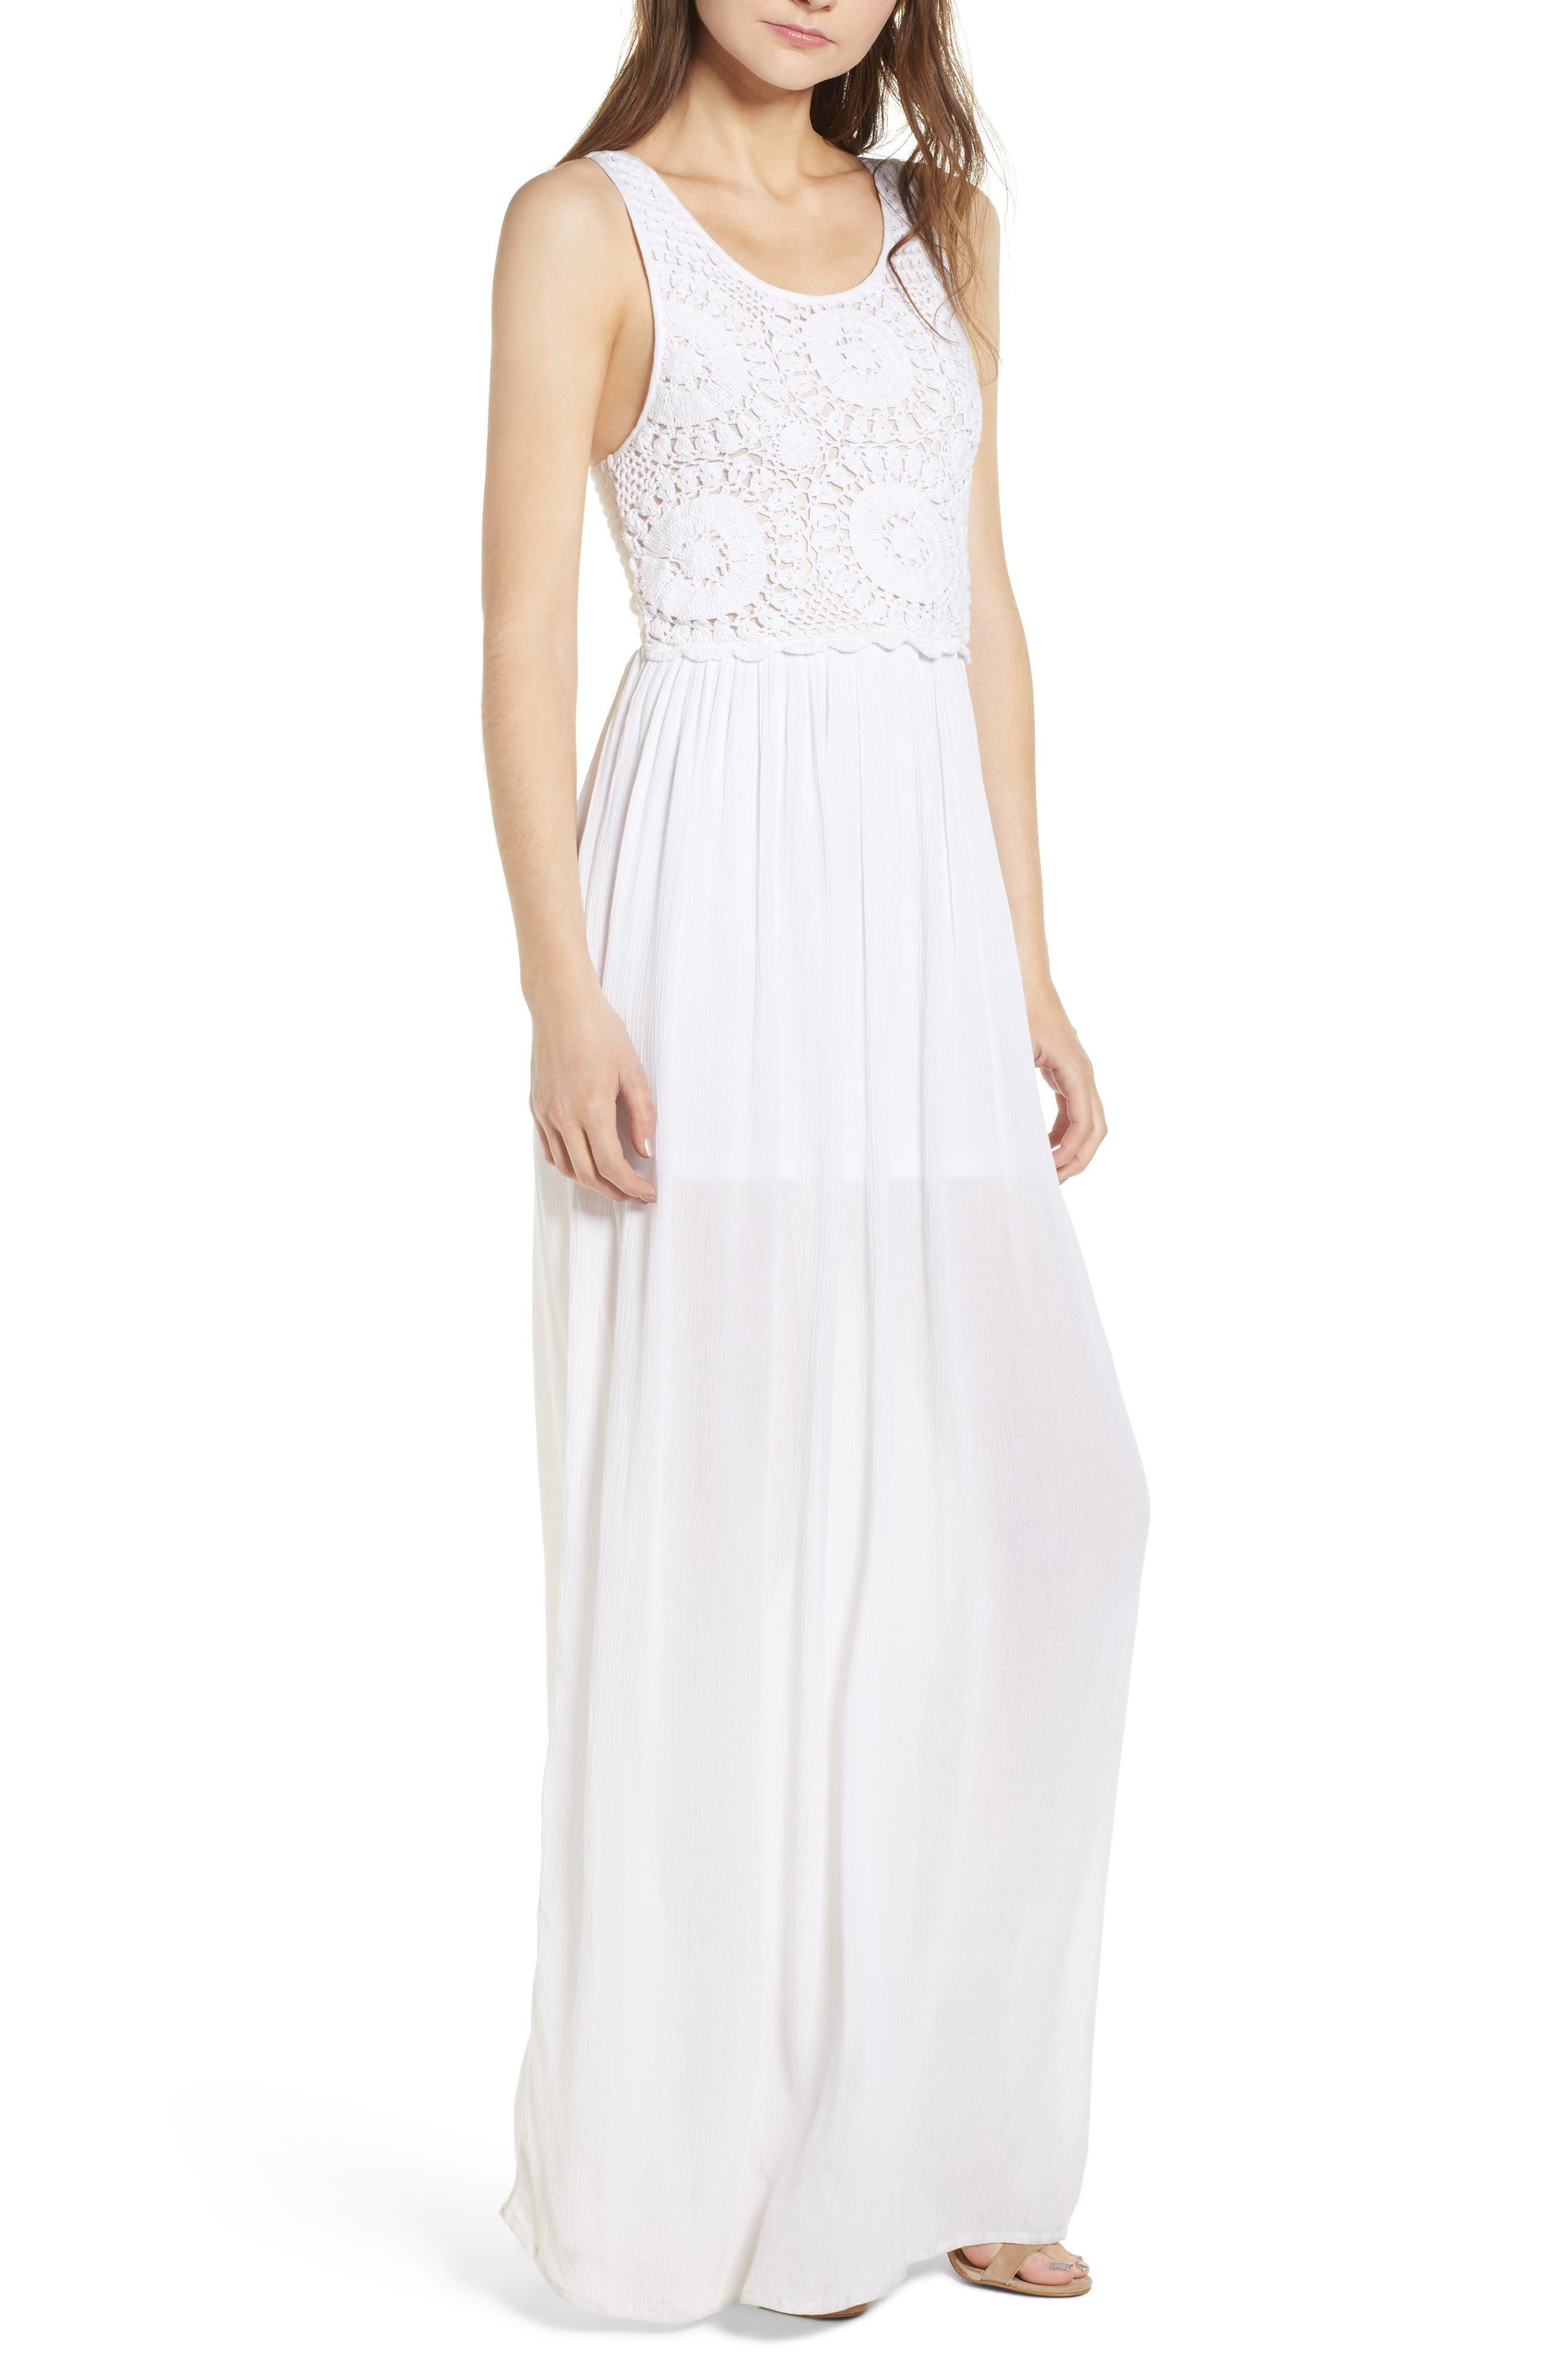 Bishop + Young Bora Bora Maxi Dress,                             Main thumbnail 1, color,                             White